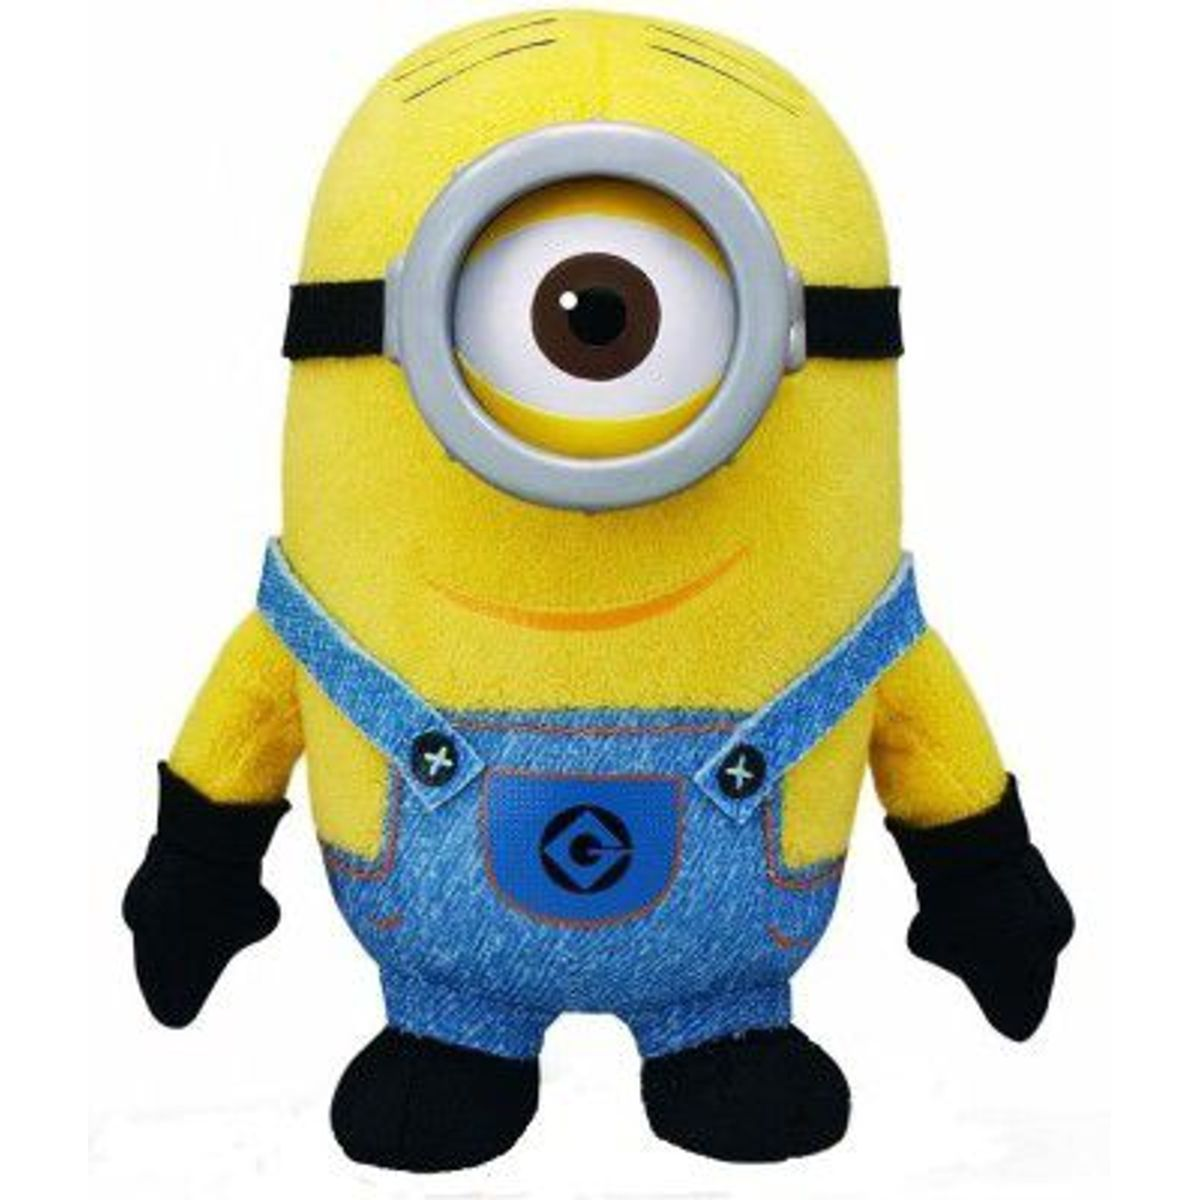 Kuhu Creations Yellow Single Eye Doll Plush Cartoon Toy